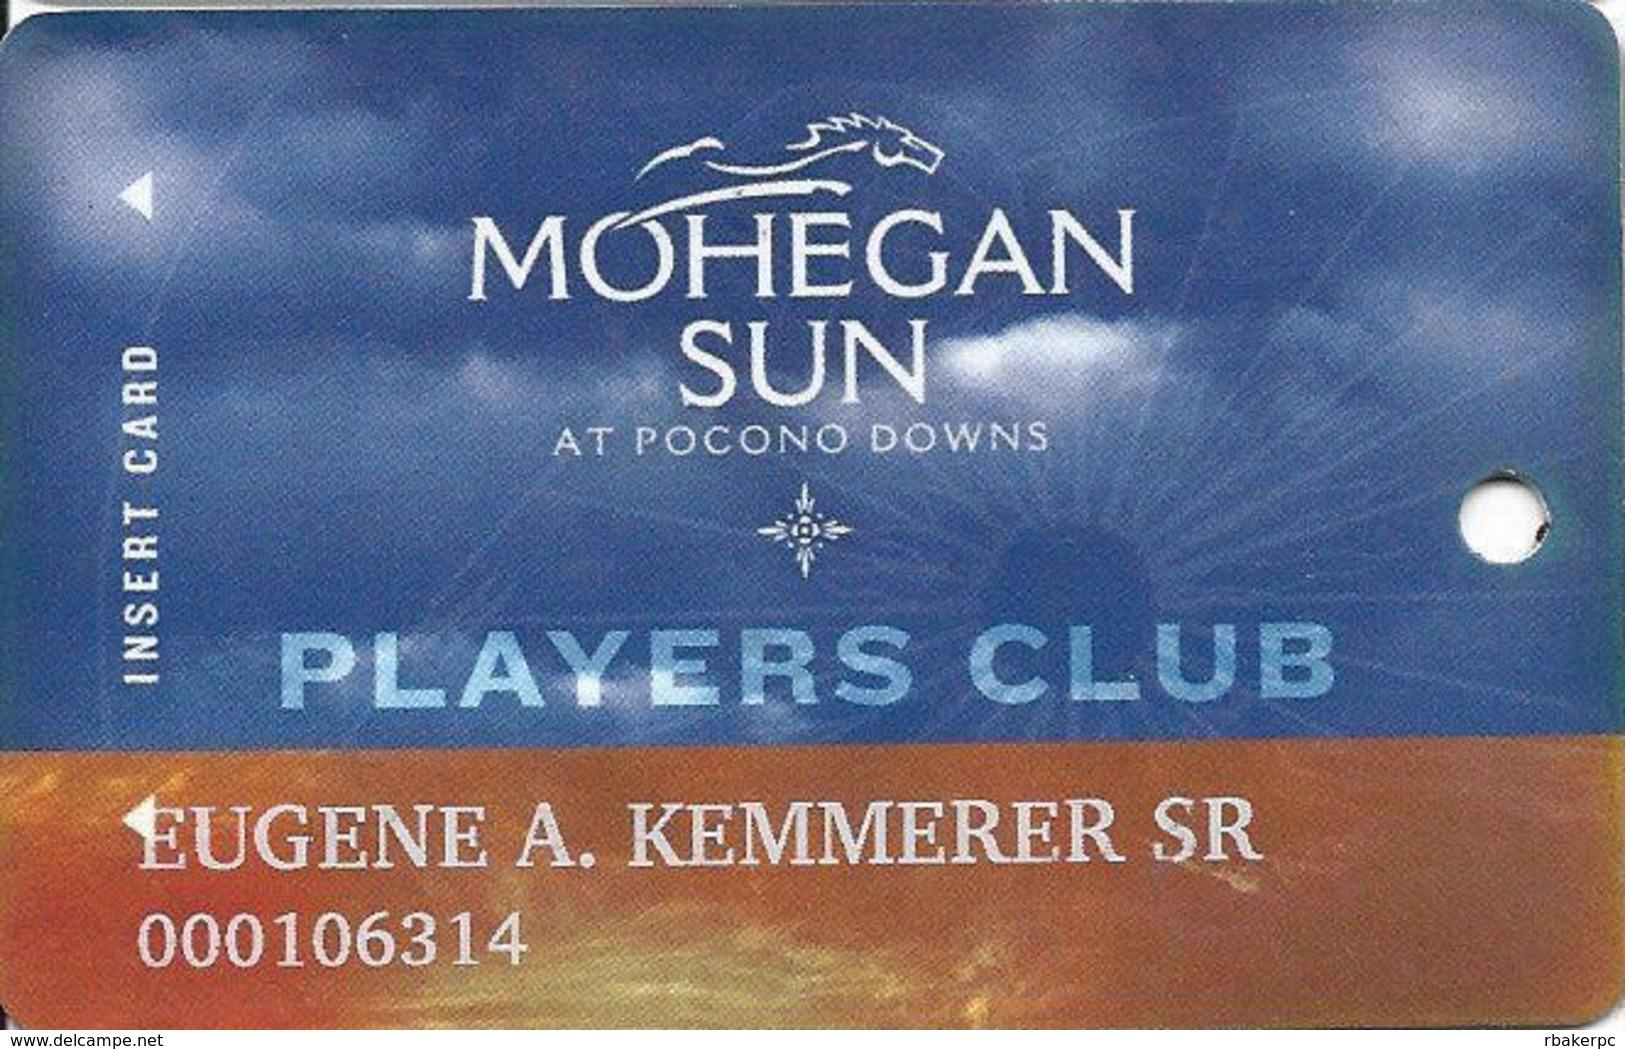 Mohegan Sun Casino At Pocono Downs - Wilks-Barre, PA USA - Slot Card - BLACK REVERSE! - Casino Cards